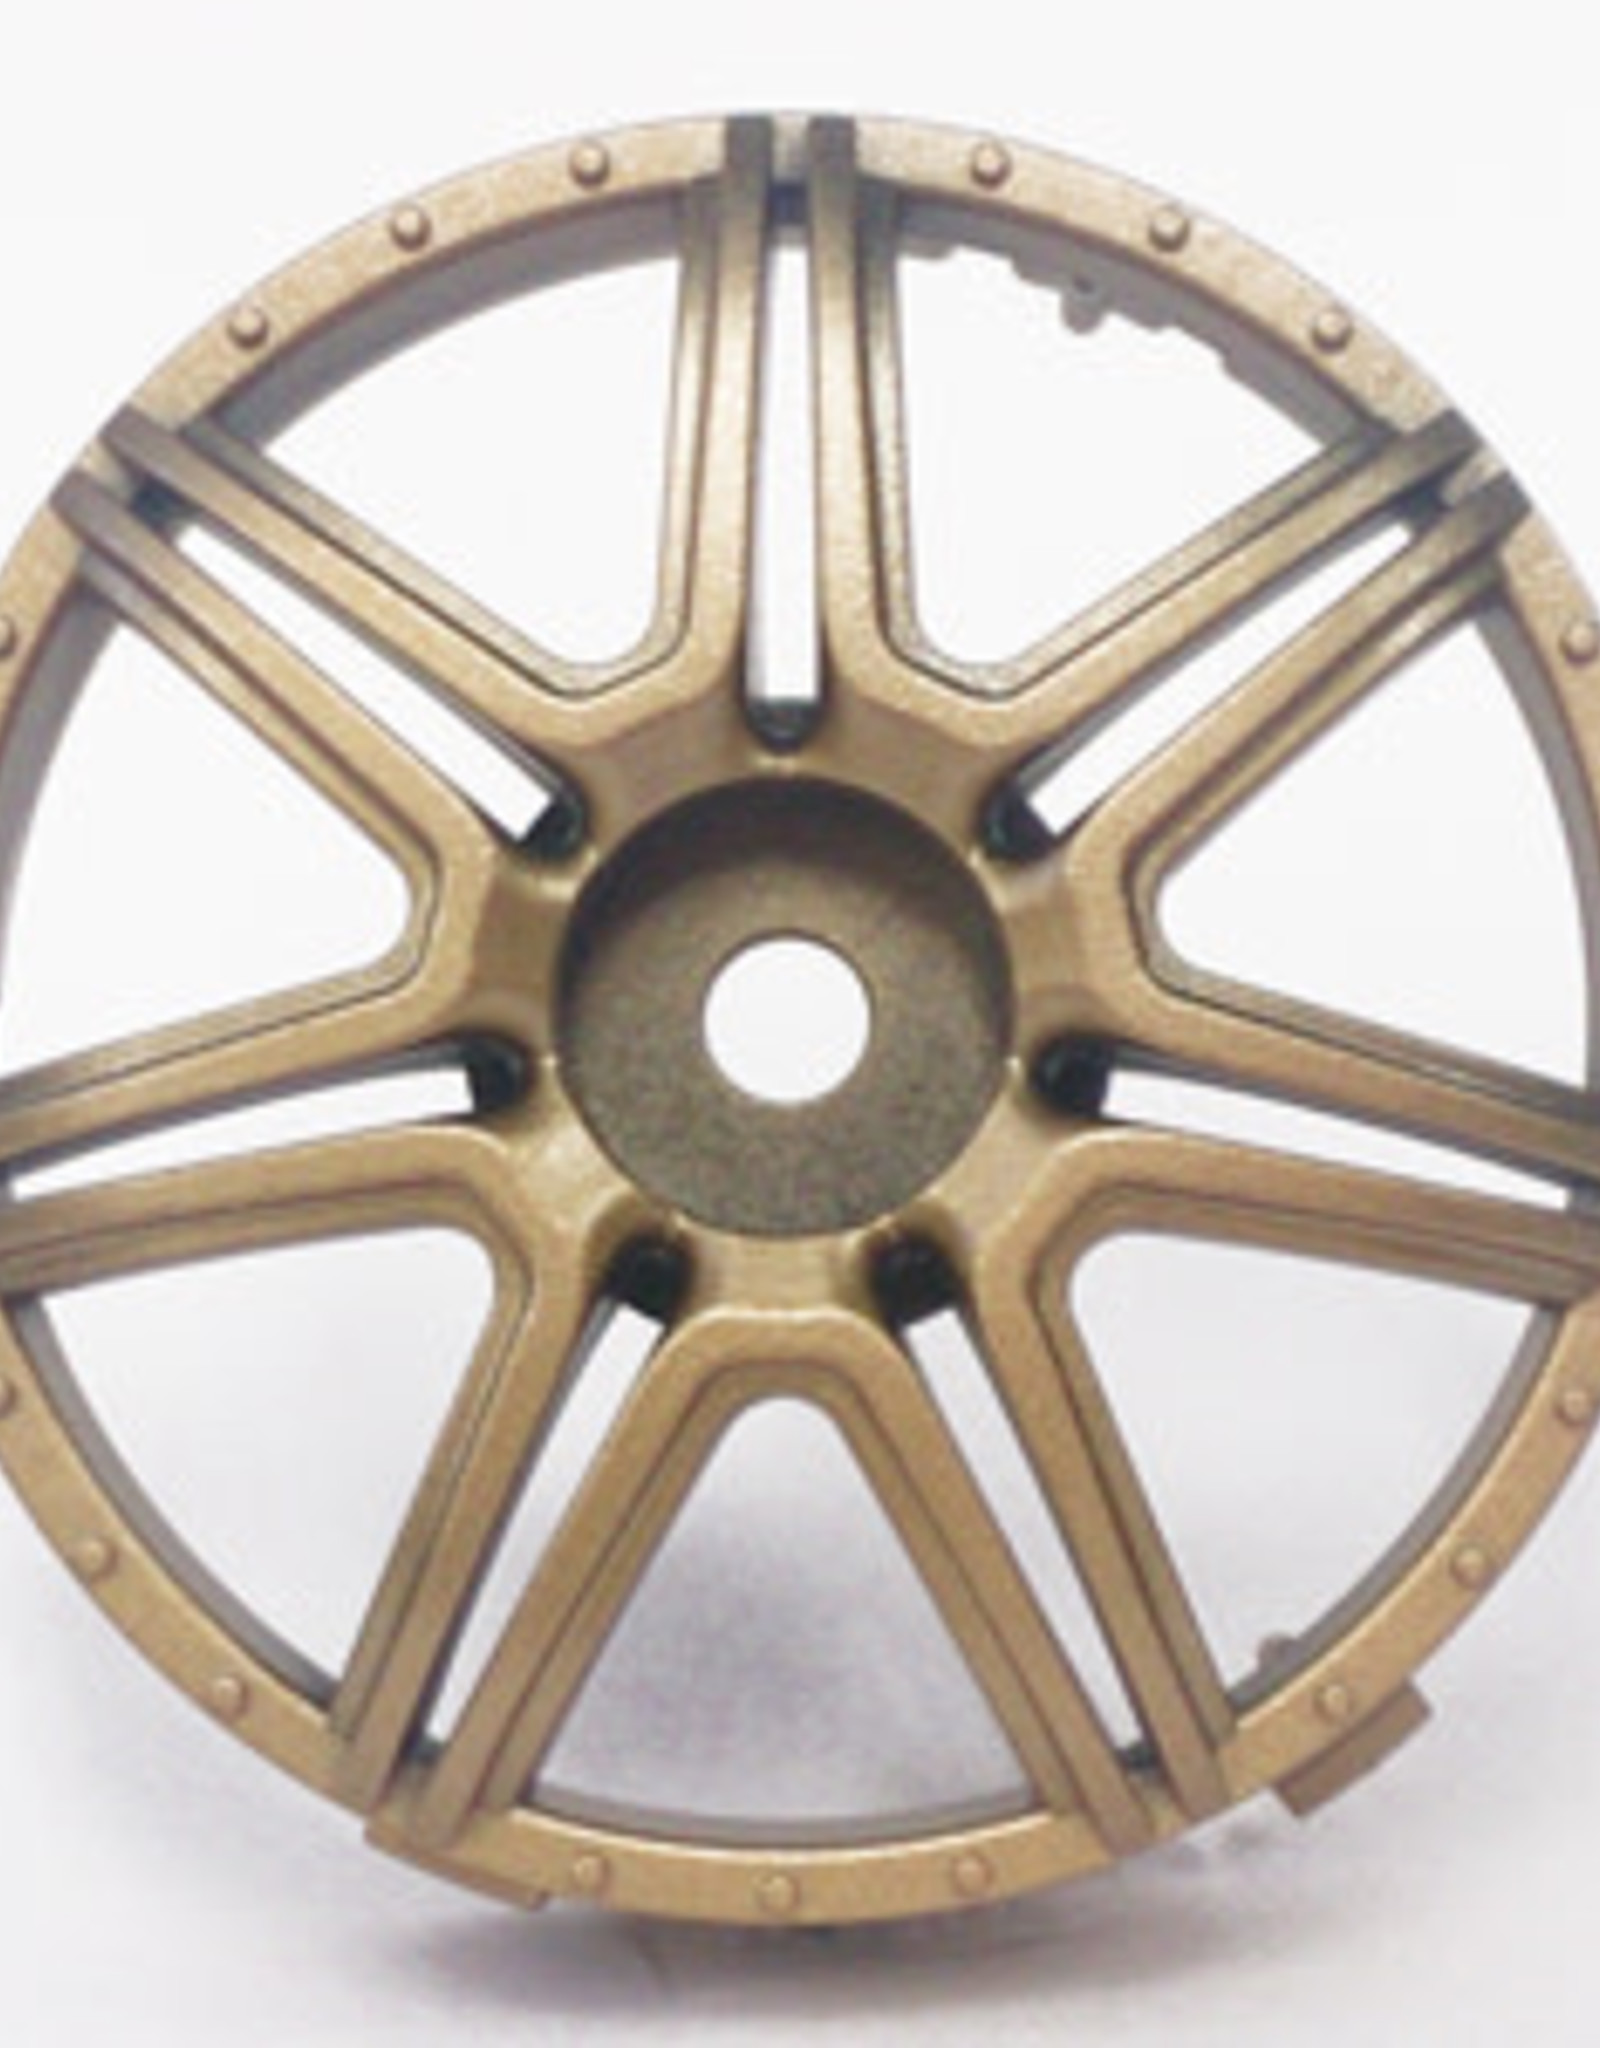 Tetsujin TT-7629 Super Rim Marguerite Gold Disks 2pcs. by Tetsujin